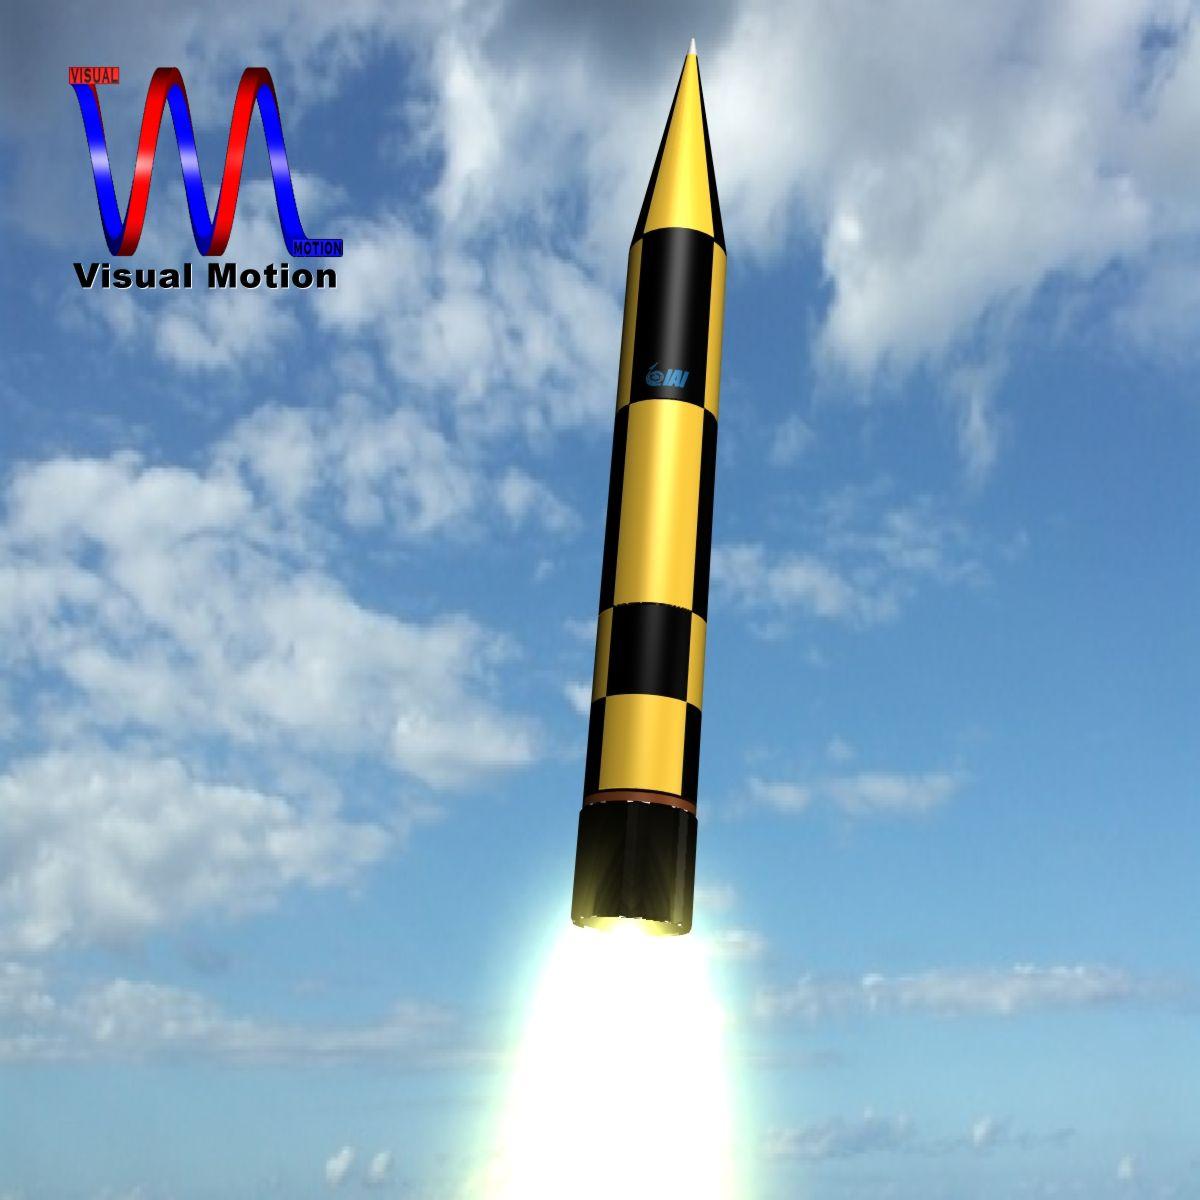 israeli arrow 3 missile 3d model 3ds dxf cob x other obj 136281